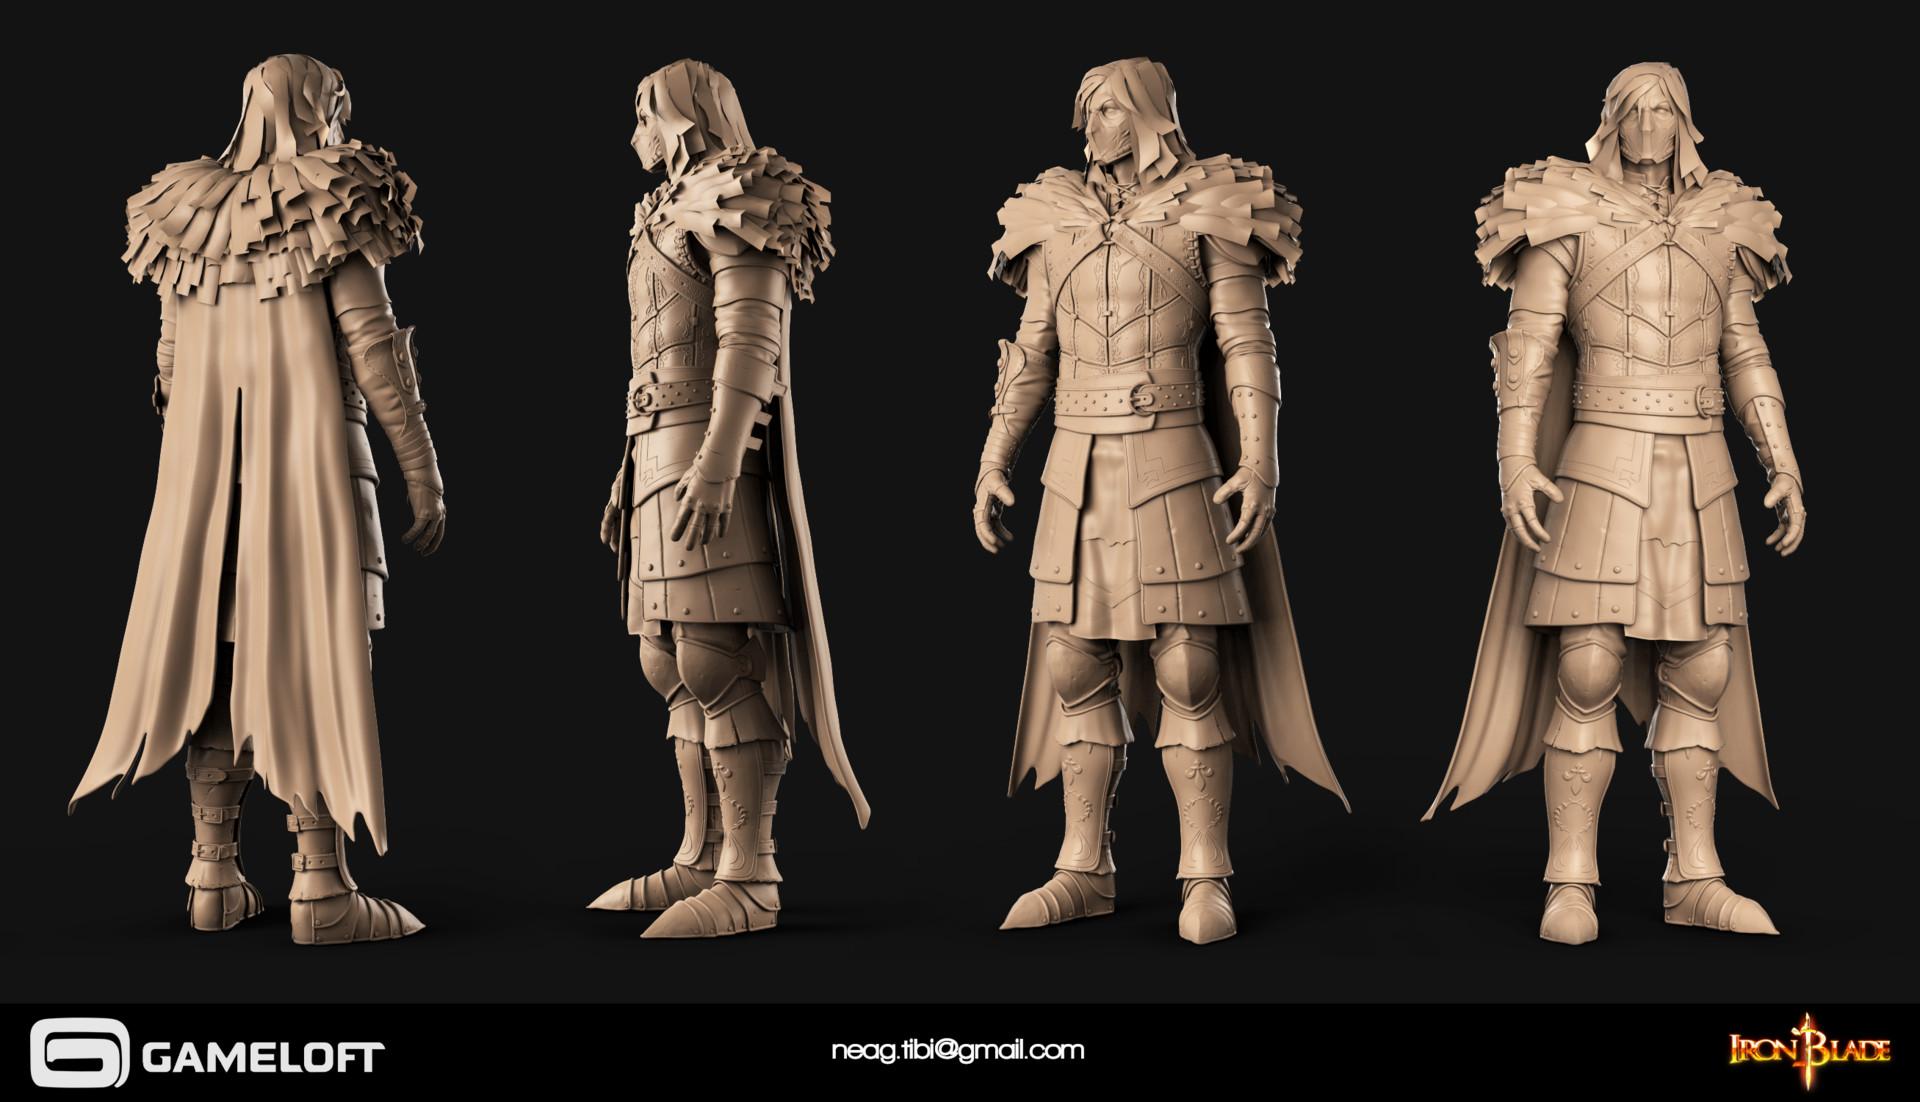 Tibi neag tibi neag iron blade mc armor 11c high poly